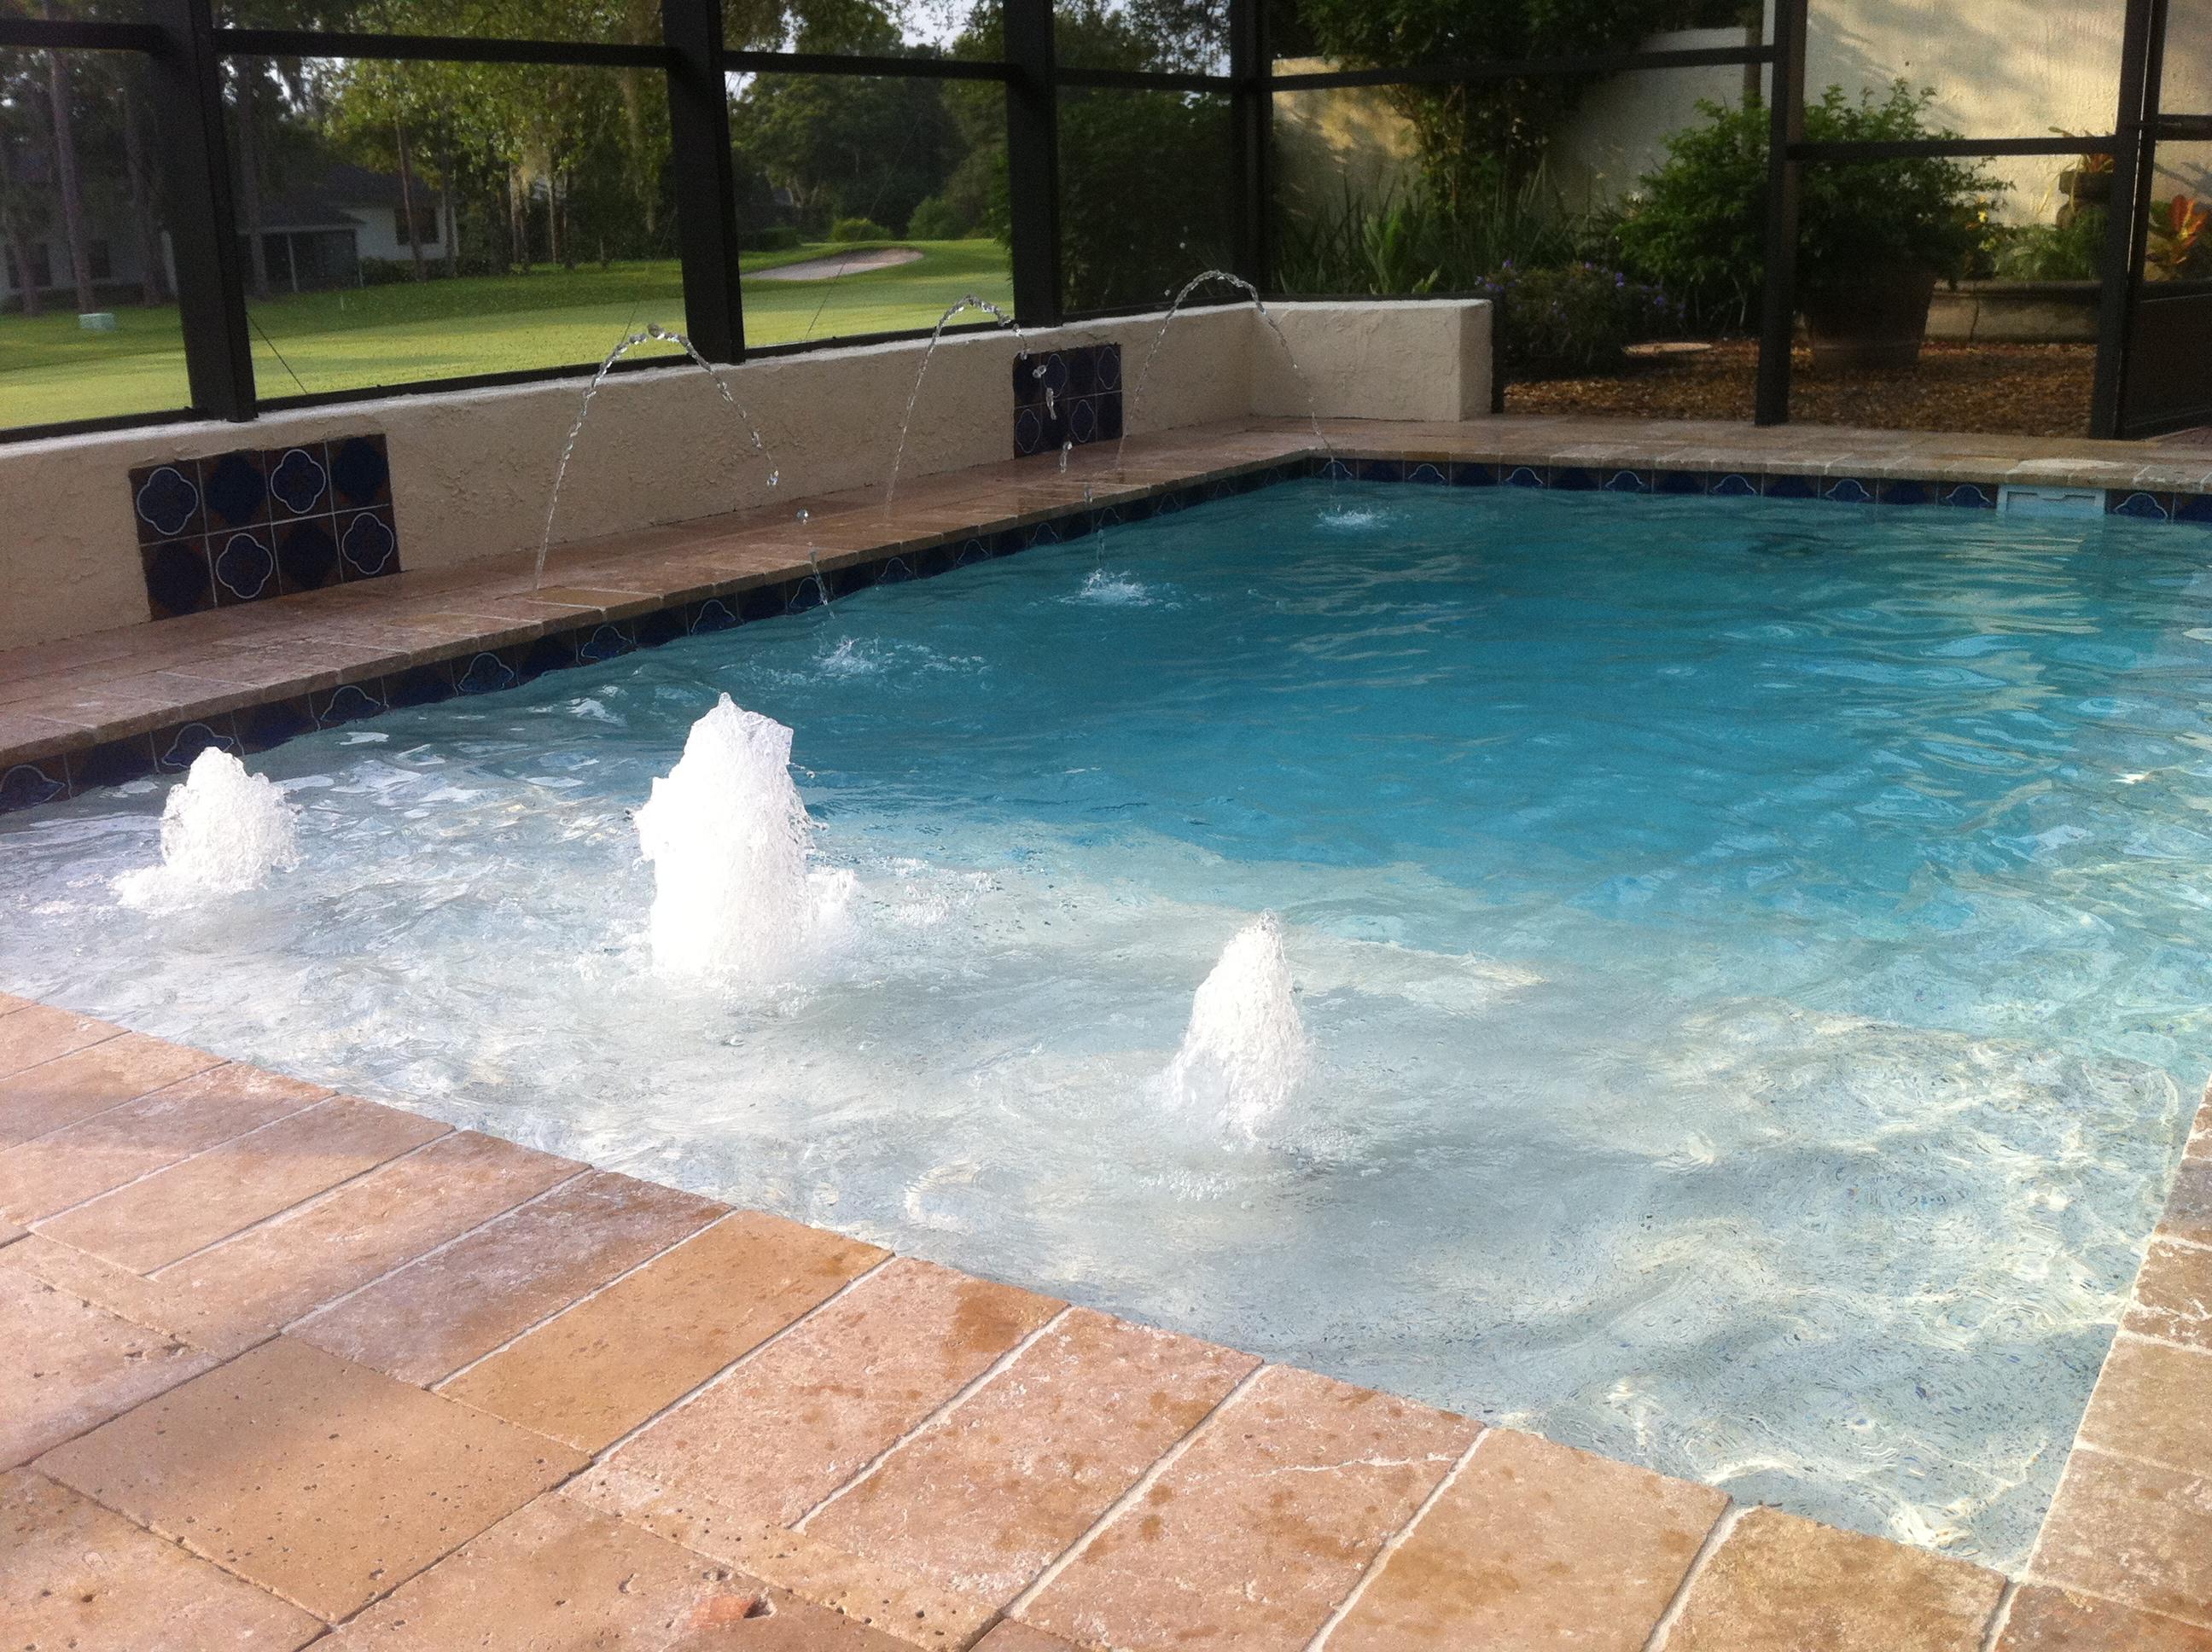 Rectangular pool designs homesfeed for Pool shapes